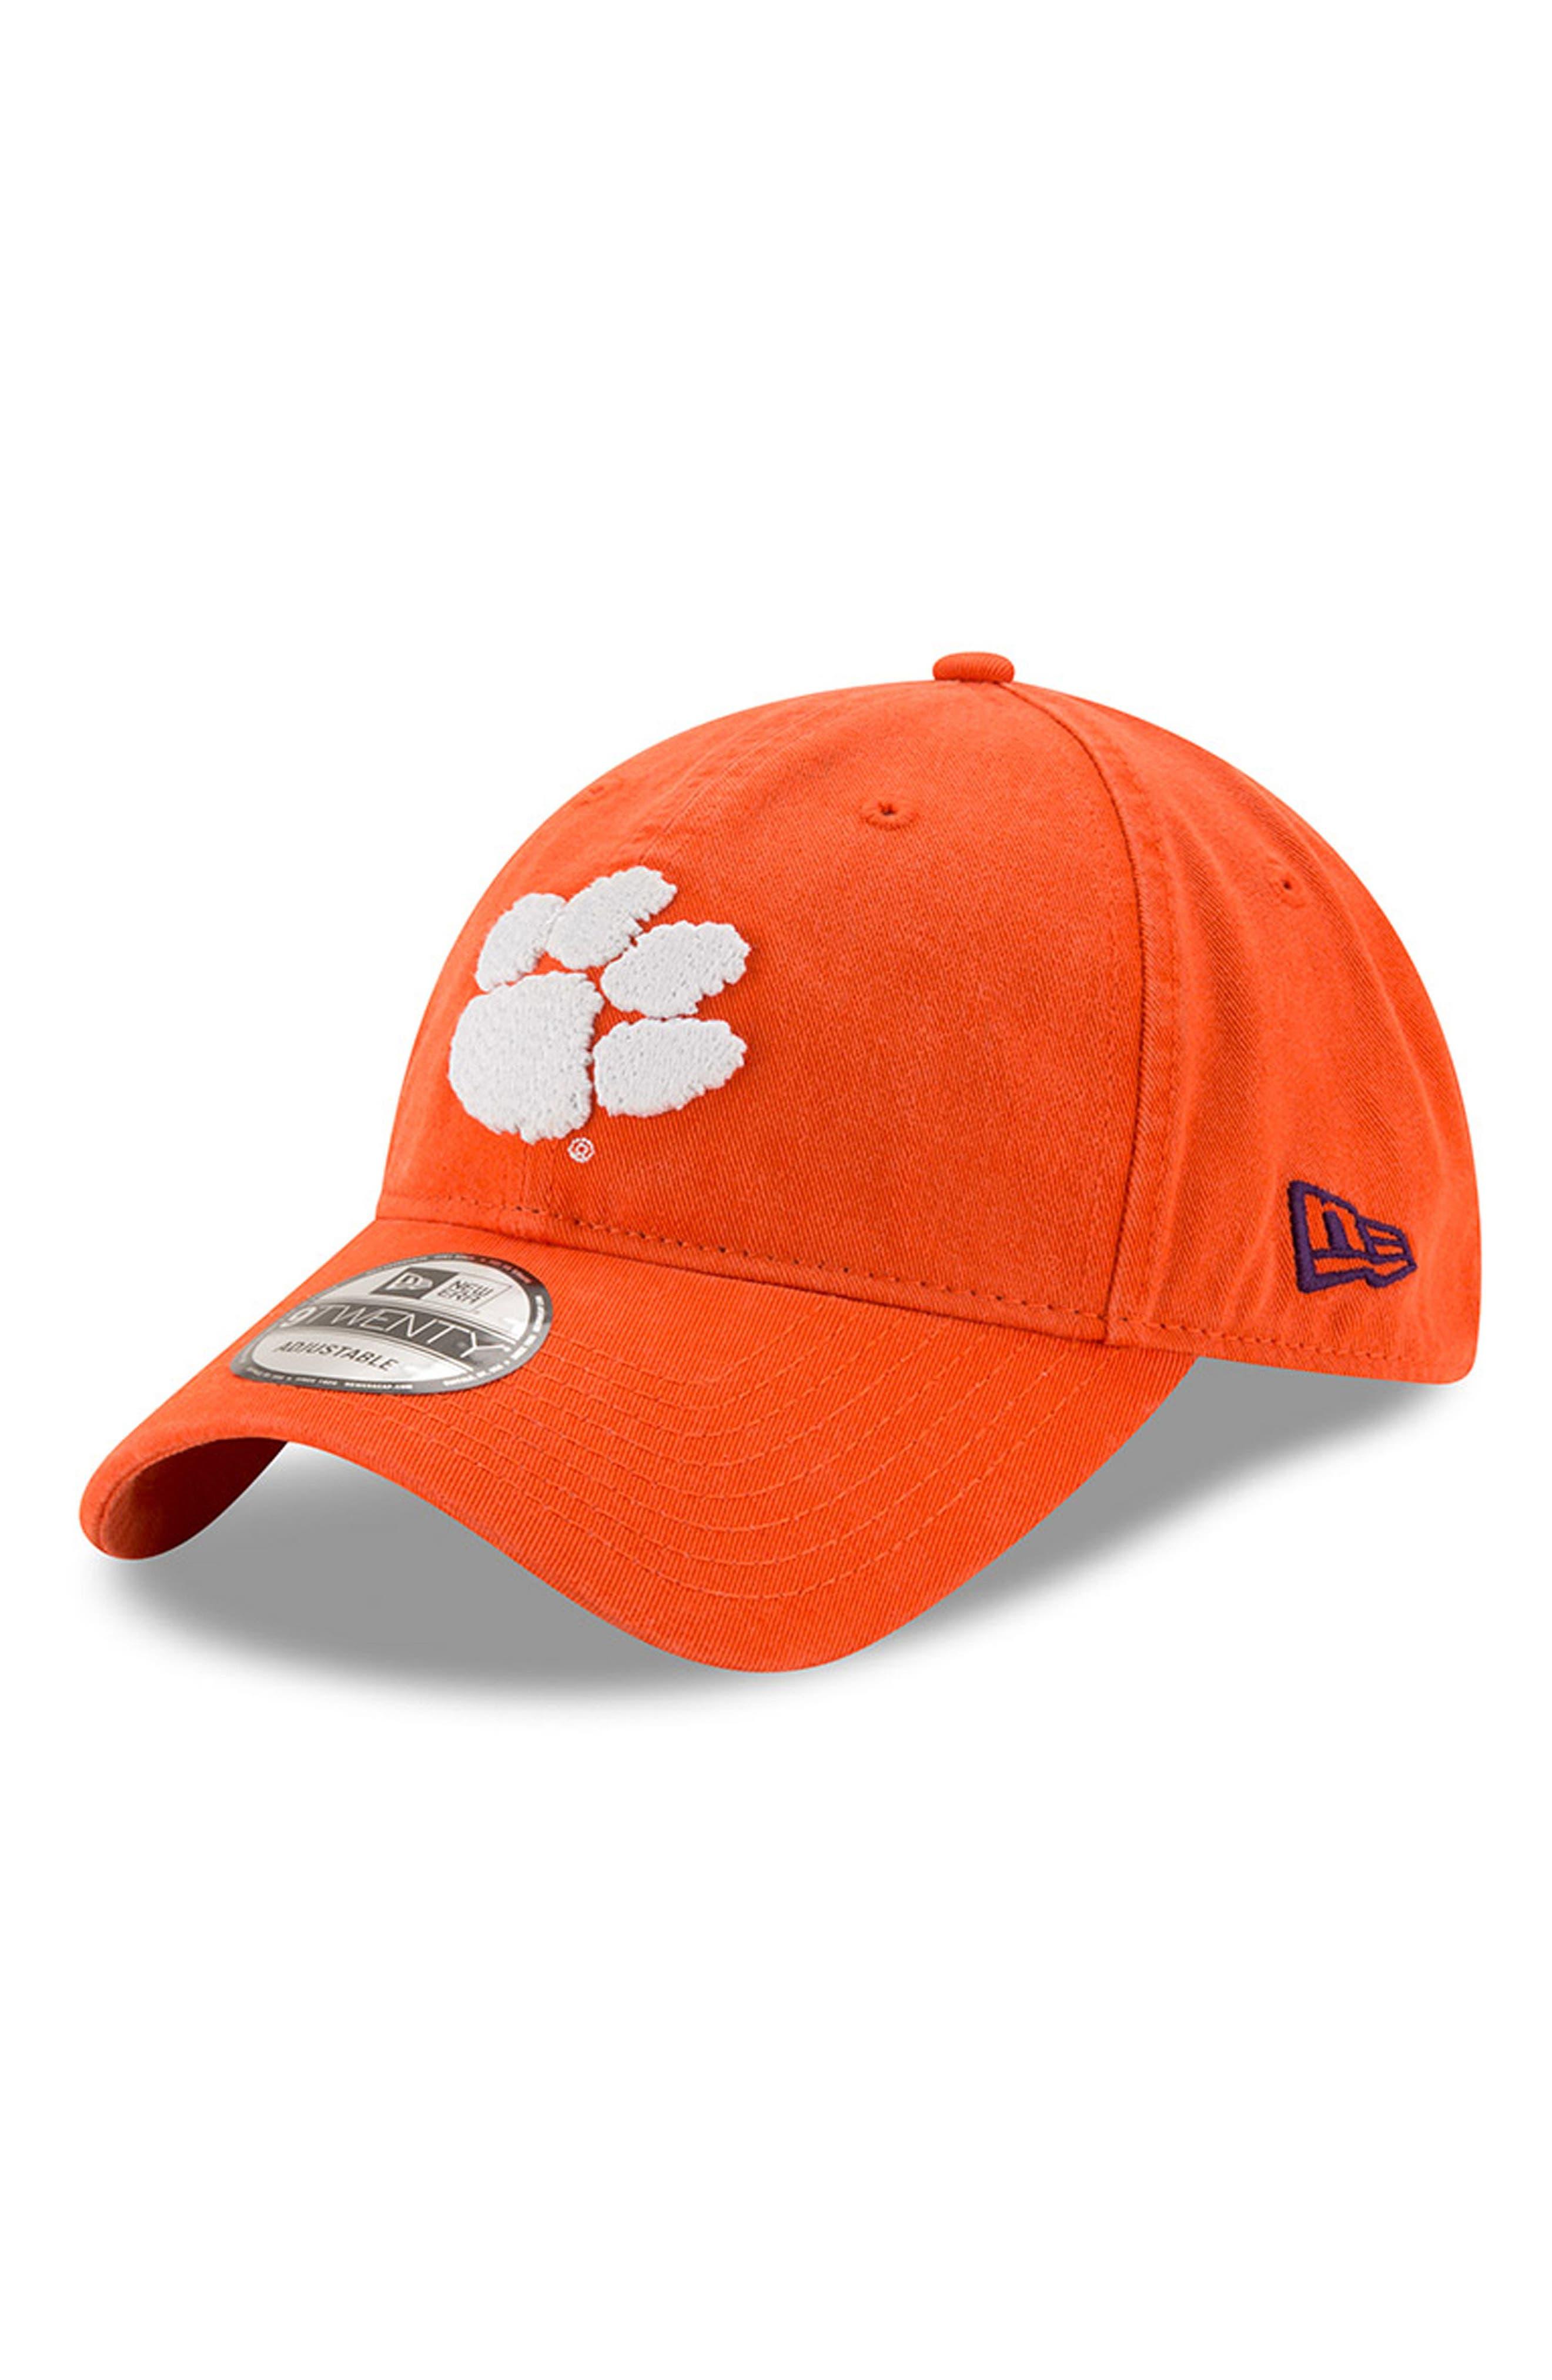 Main Image - New Era Collegiate Core Classic - Clemson Tigers Baseball Cap